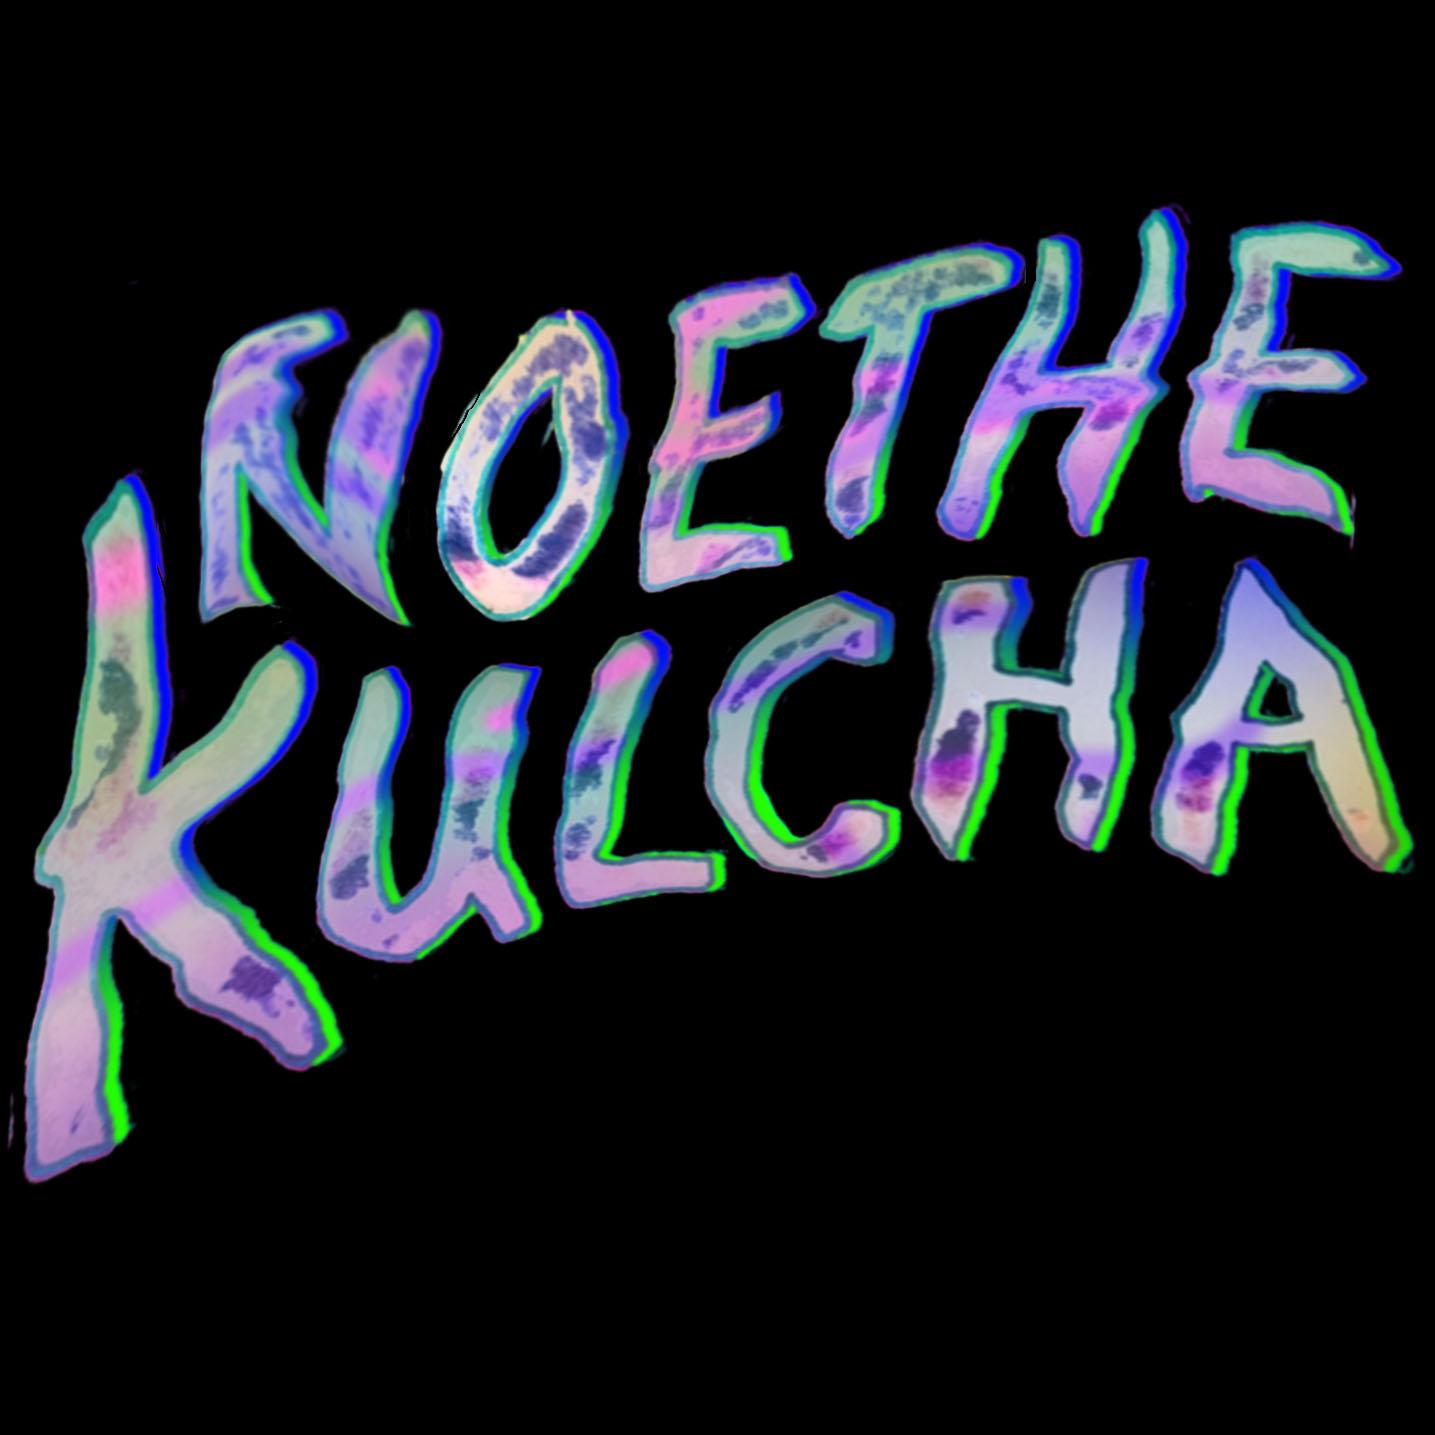 NoeTheKulcha